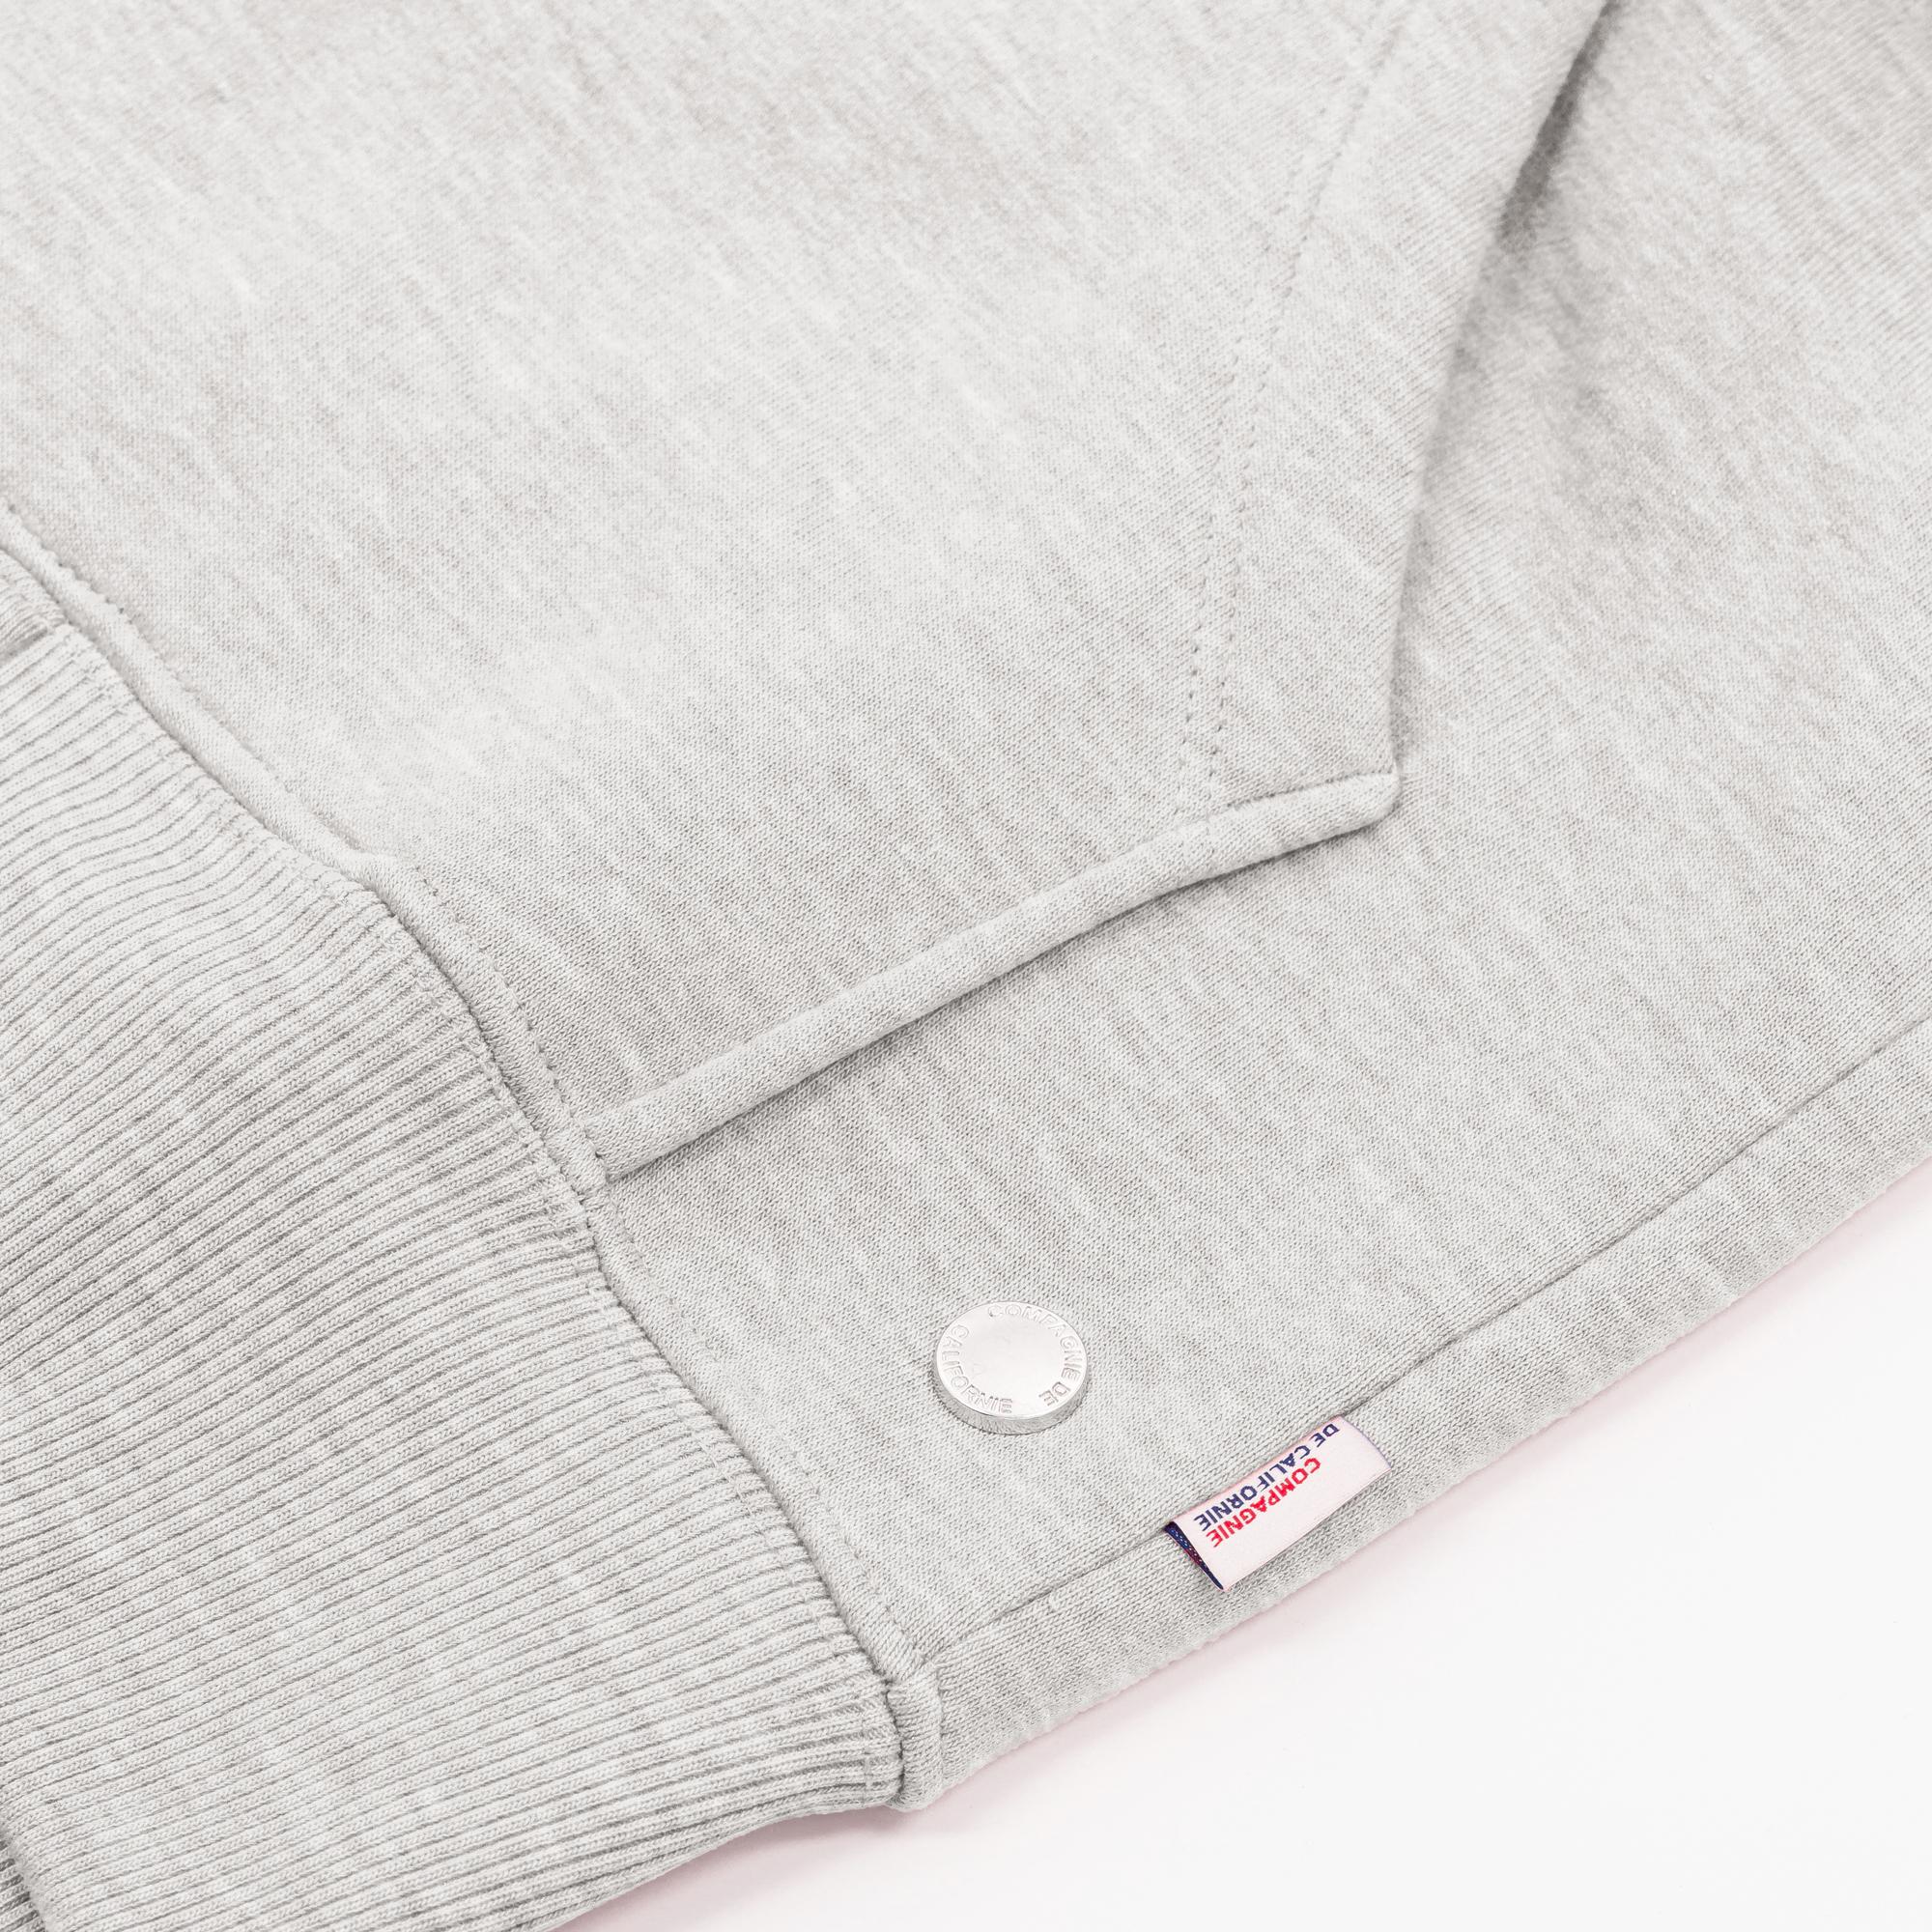 new cupertino hoodie zip heather grey 2.